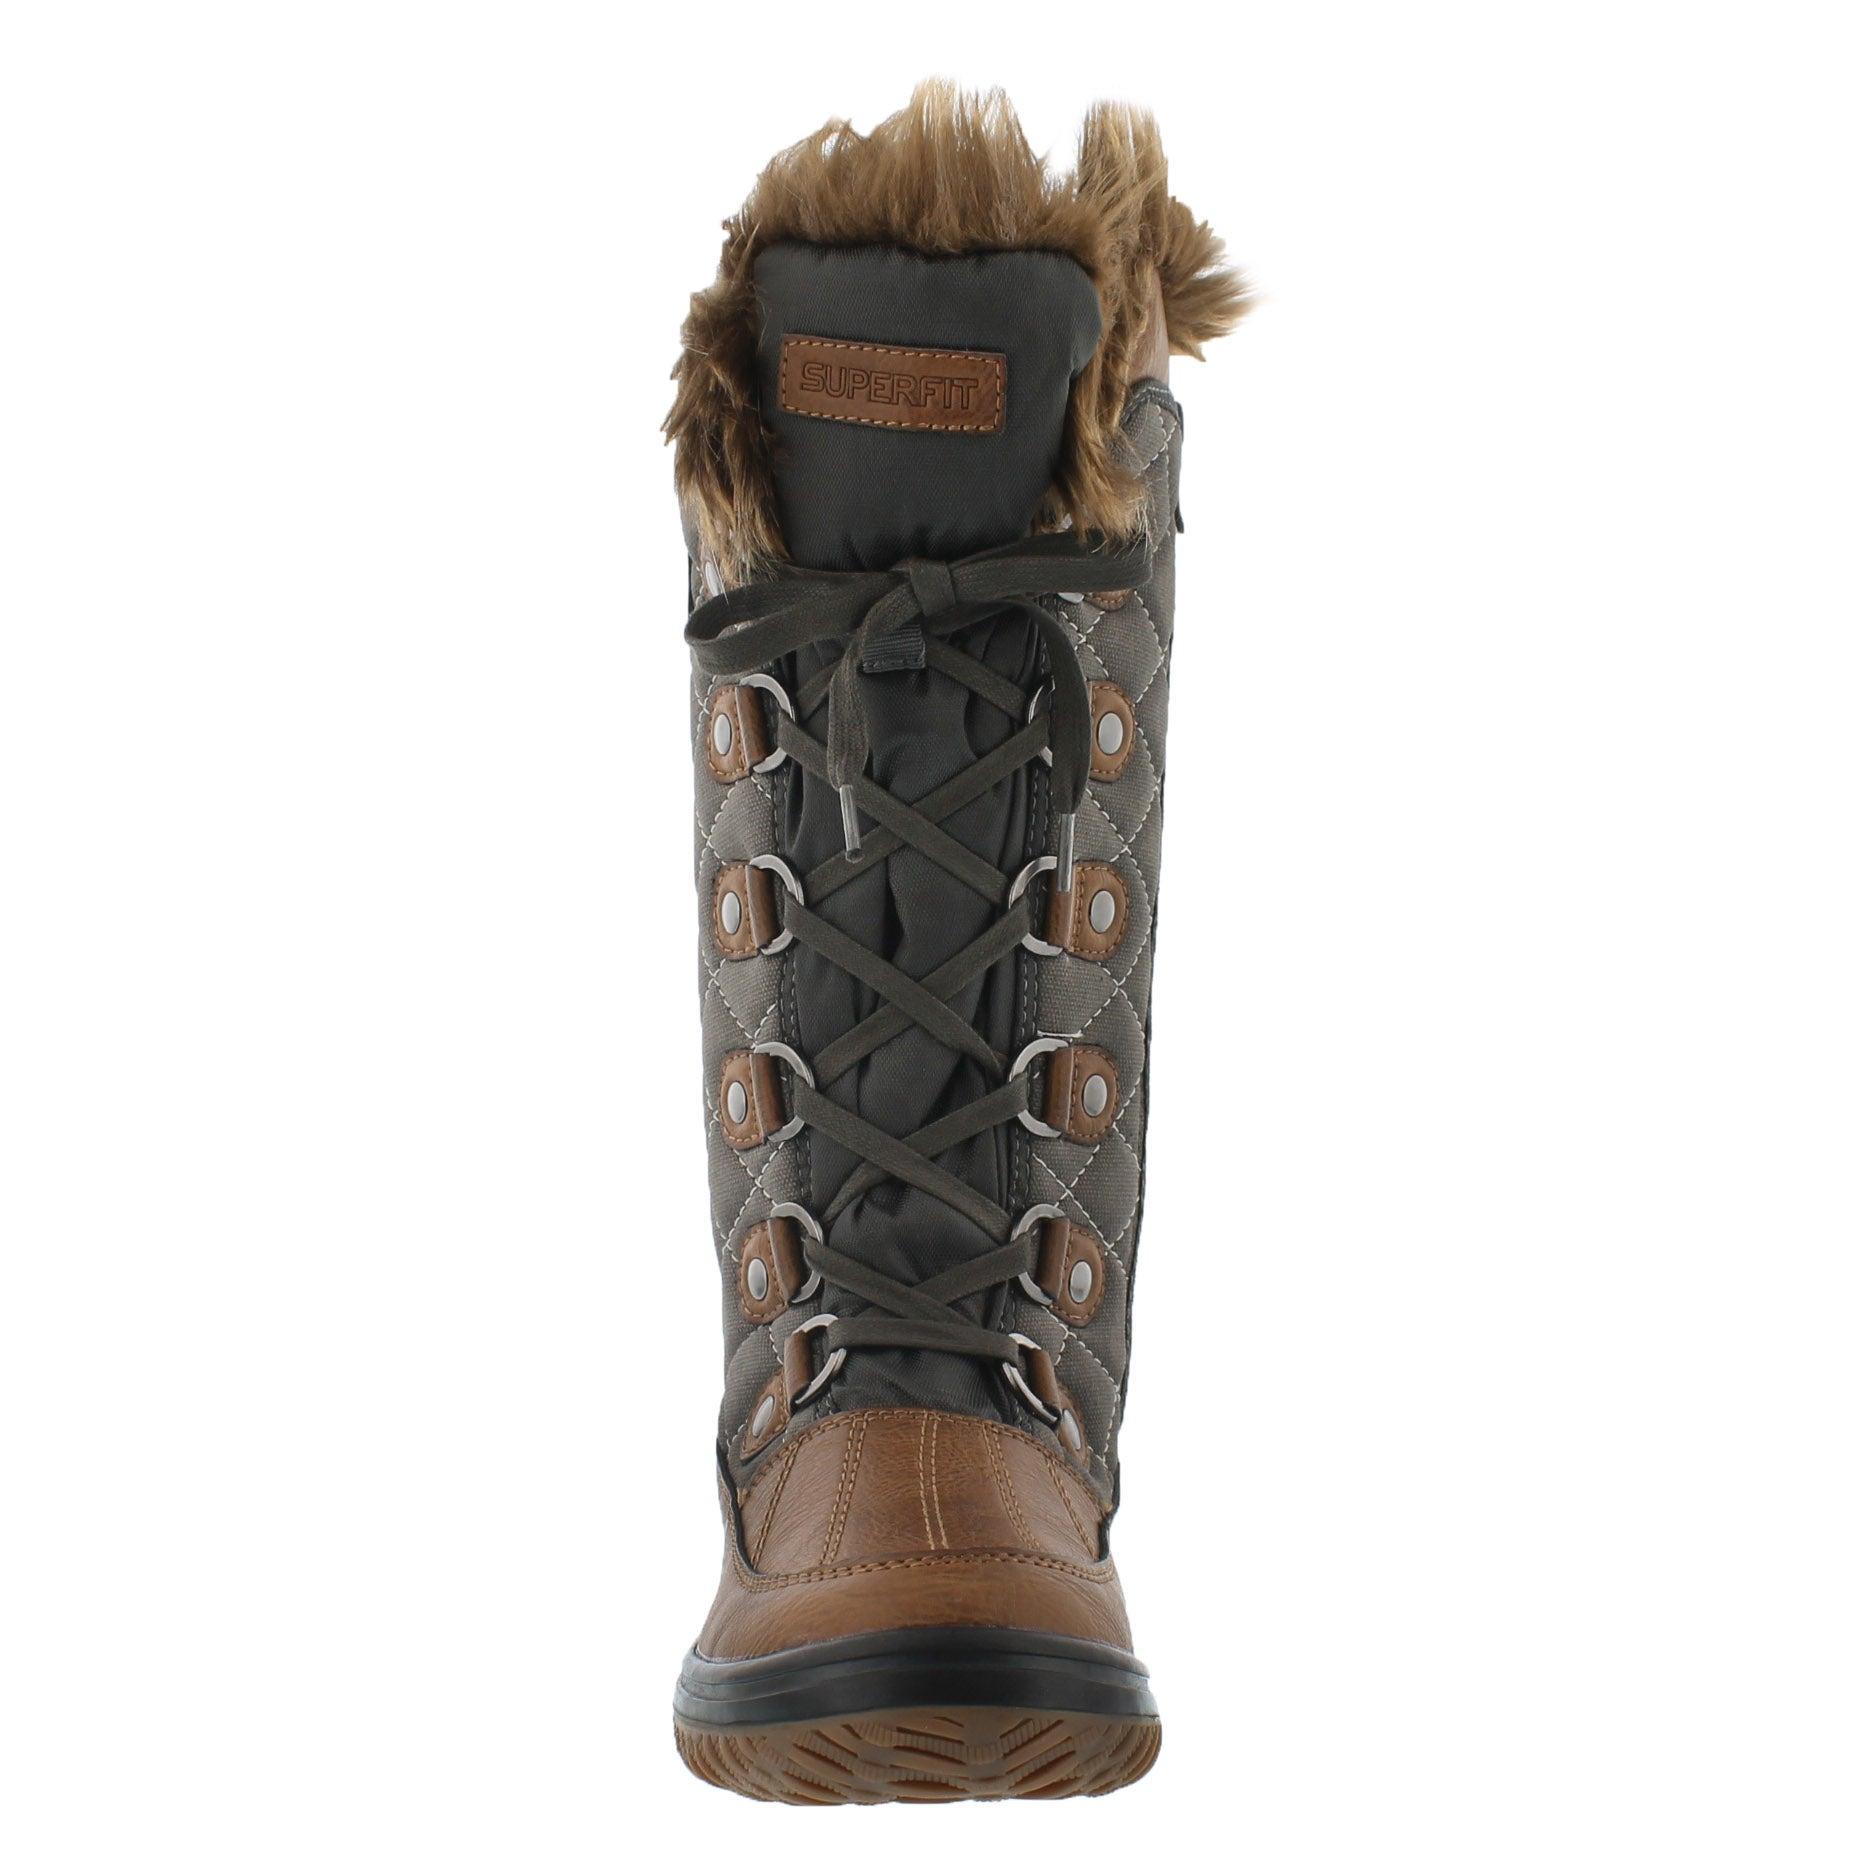 Lds Destiny brndy/mush wtrpf winter boot